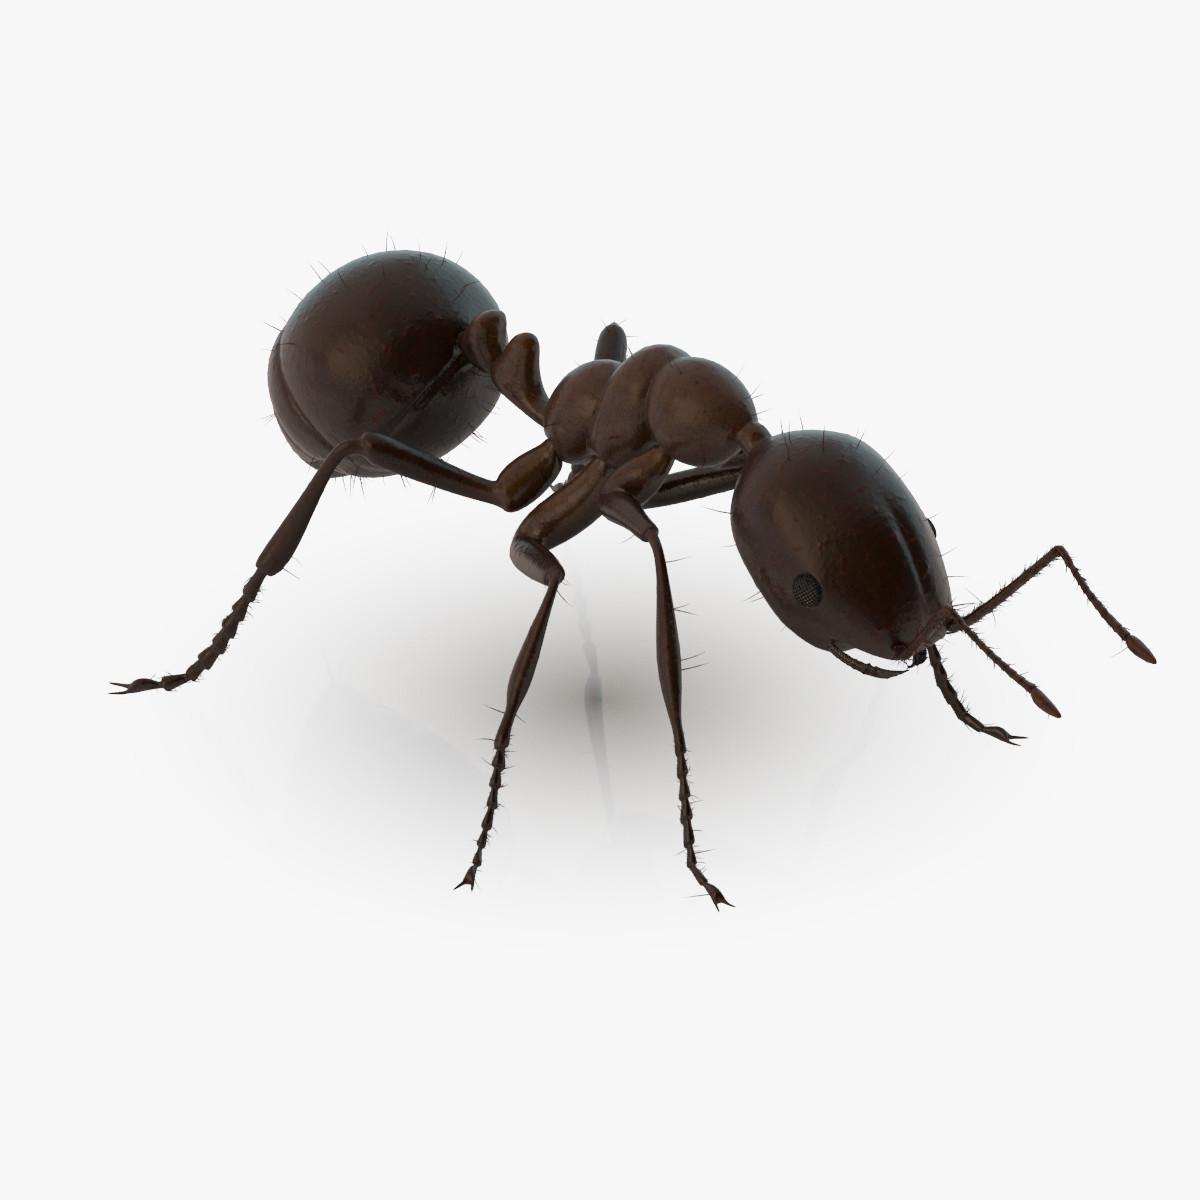 Ant_00001.jpg